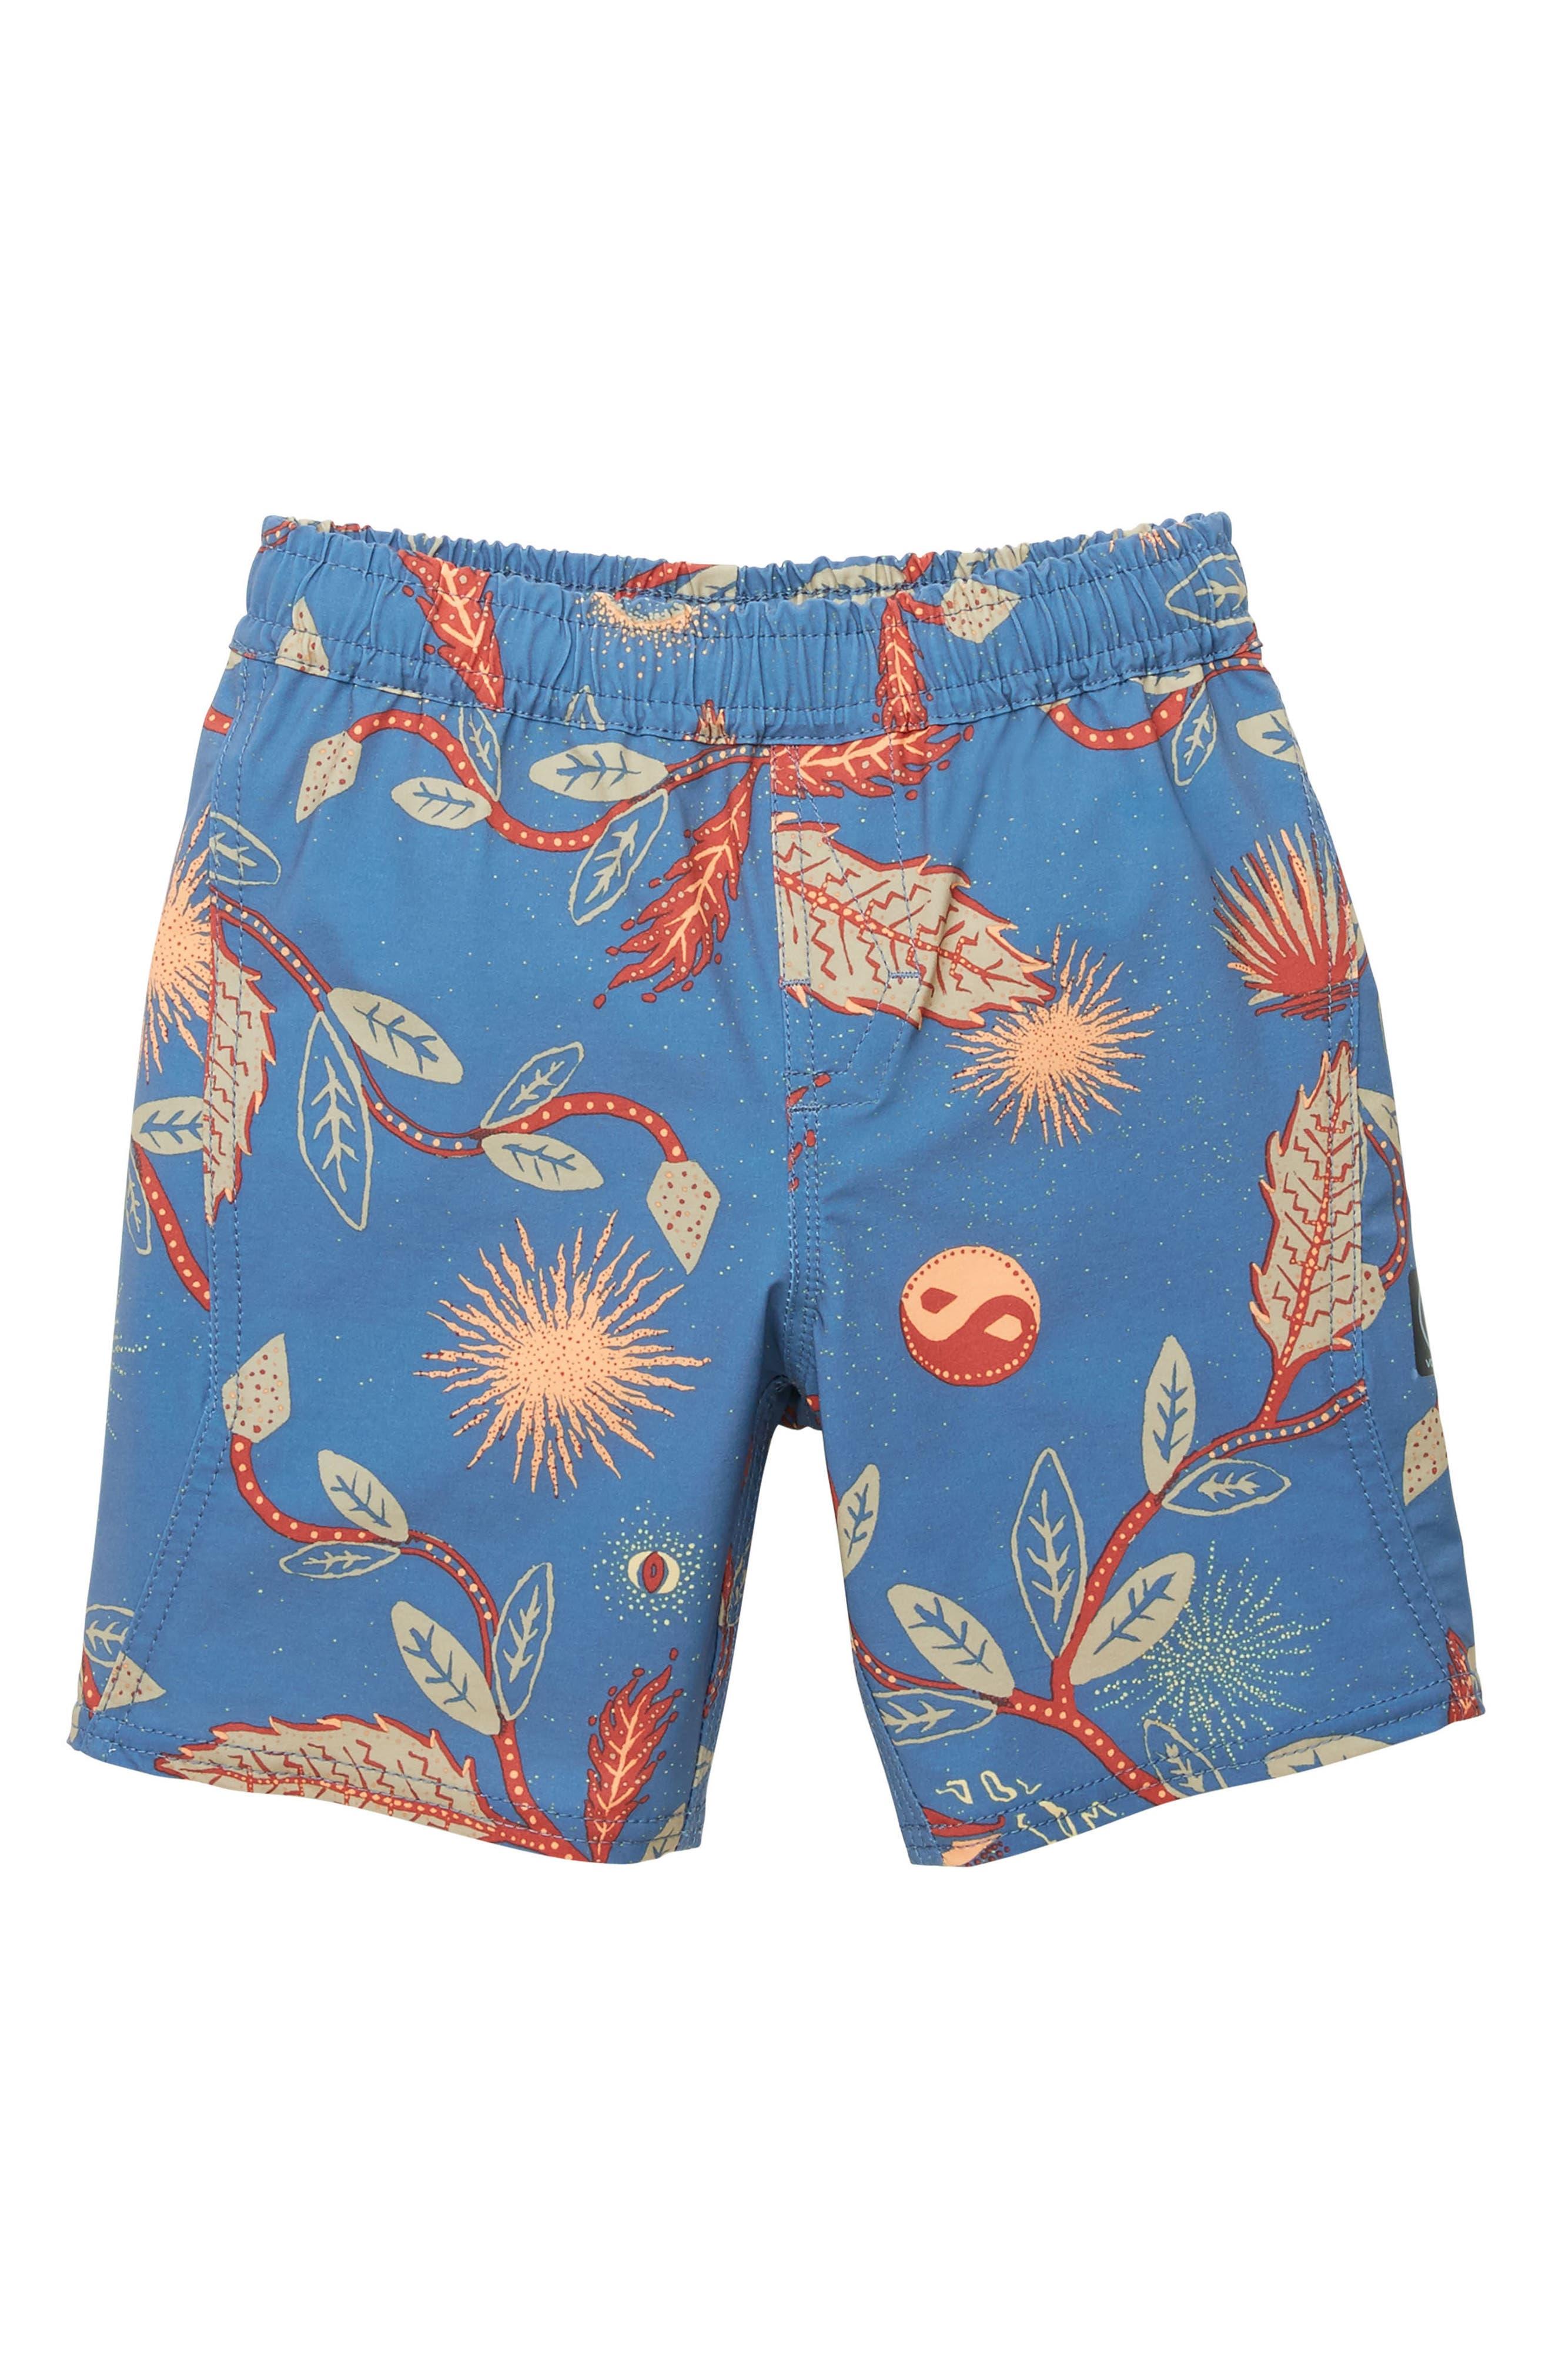 Volcom Broha Volley Shorts (Toddler Boys & Little Boys)